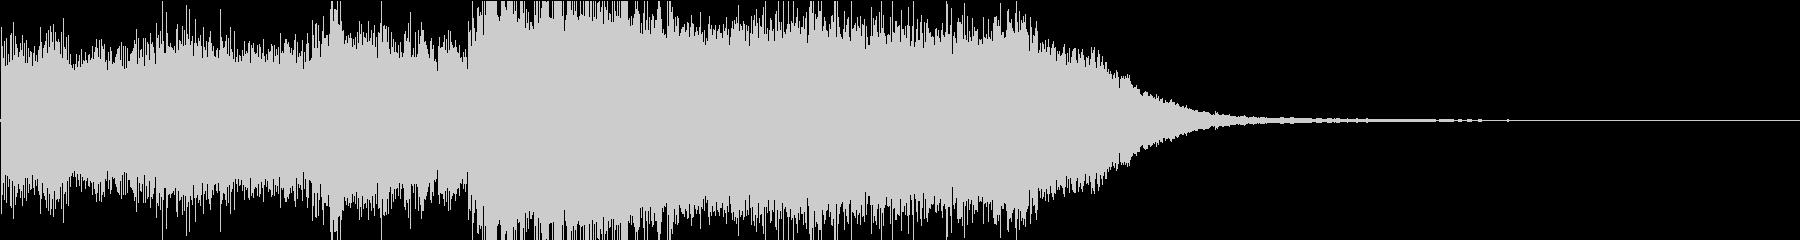 PCやゲーム機の起動音をイメージの未再生の波形